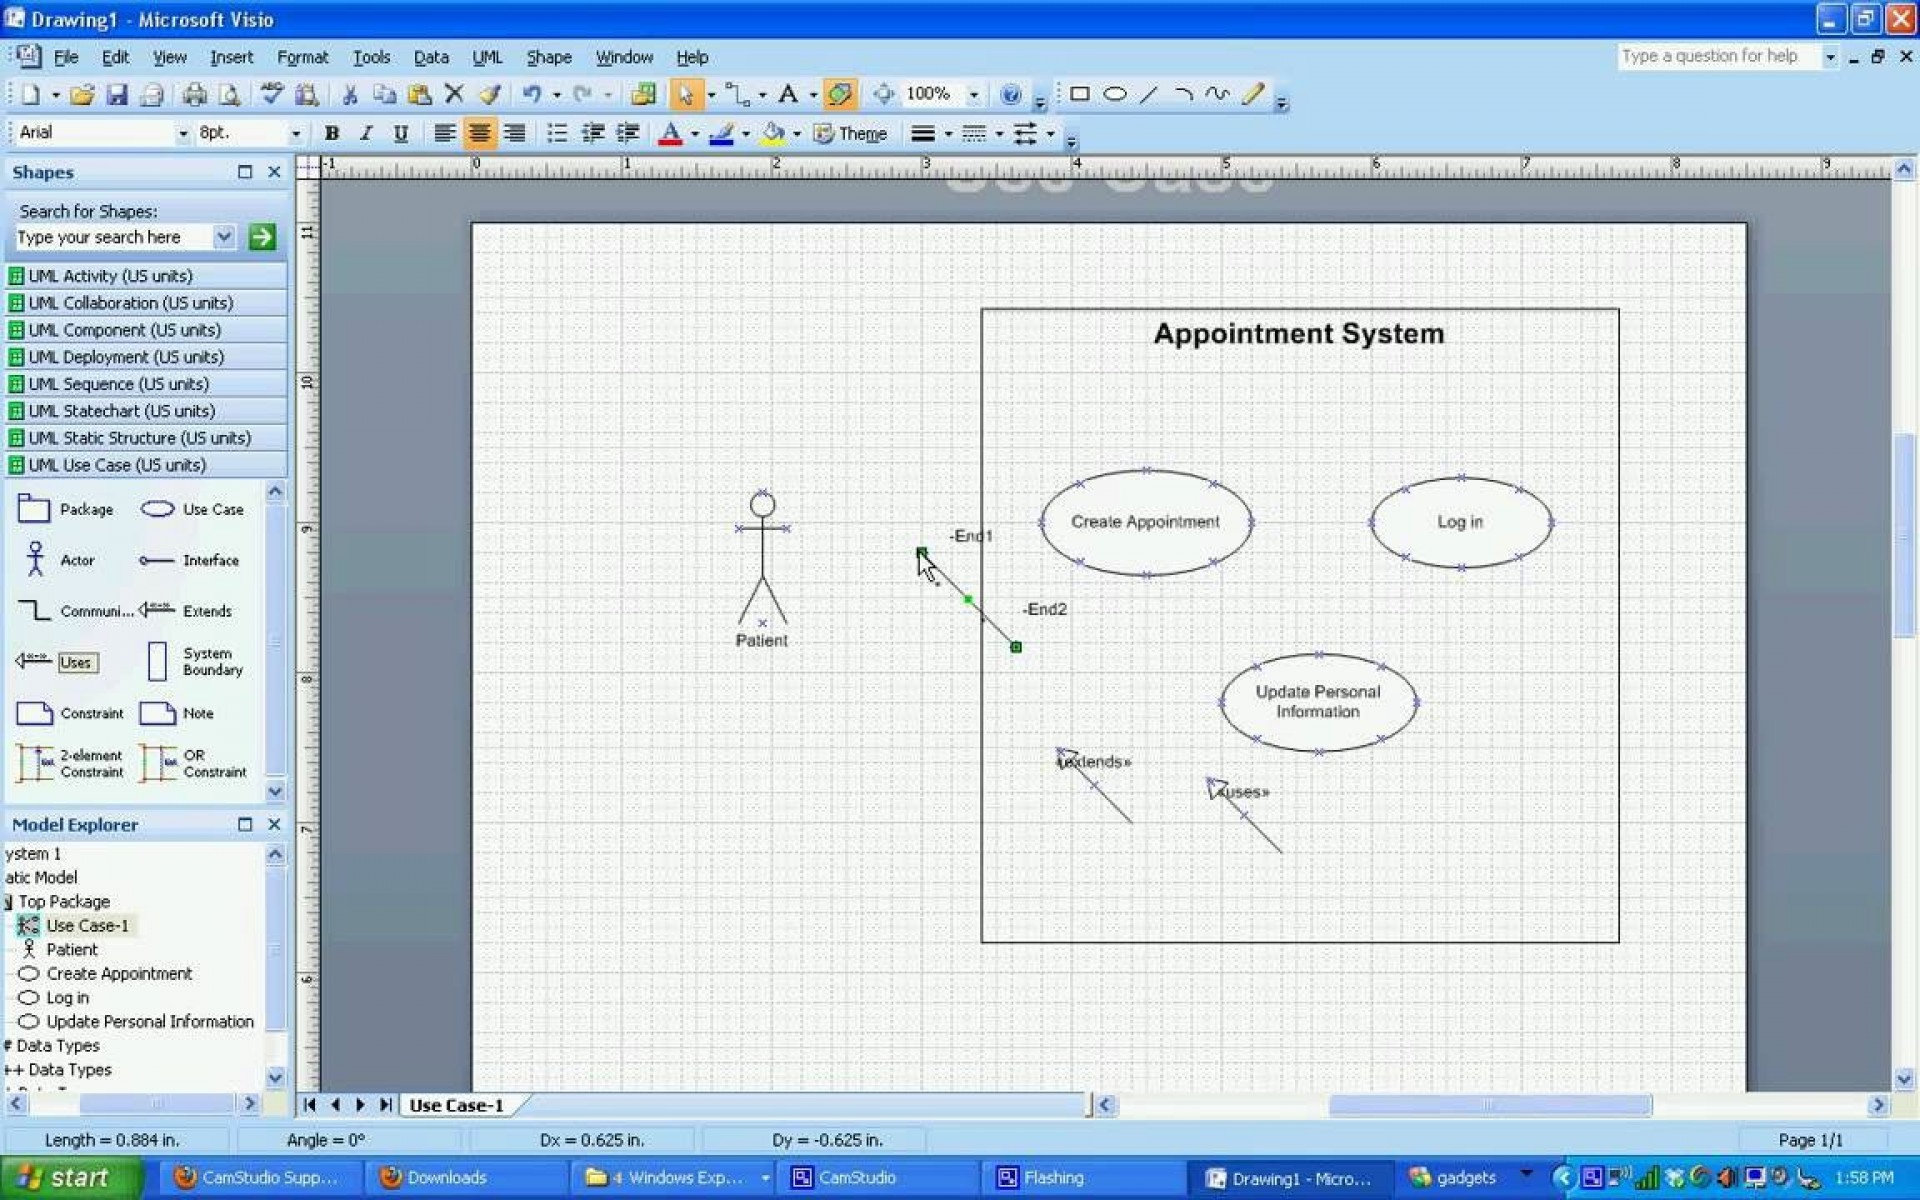 004 Formidable Use Case Diagram Template Visio 2010 High Def  Uml Model Download Clas1920